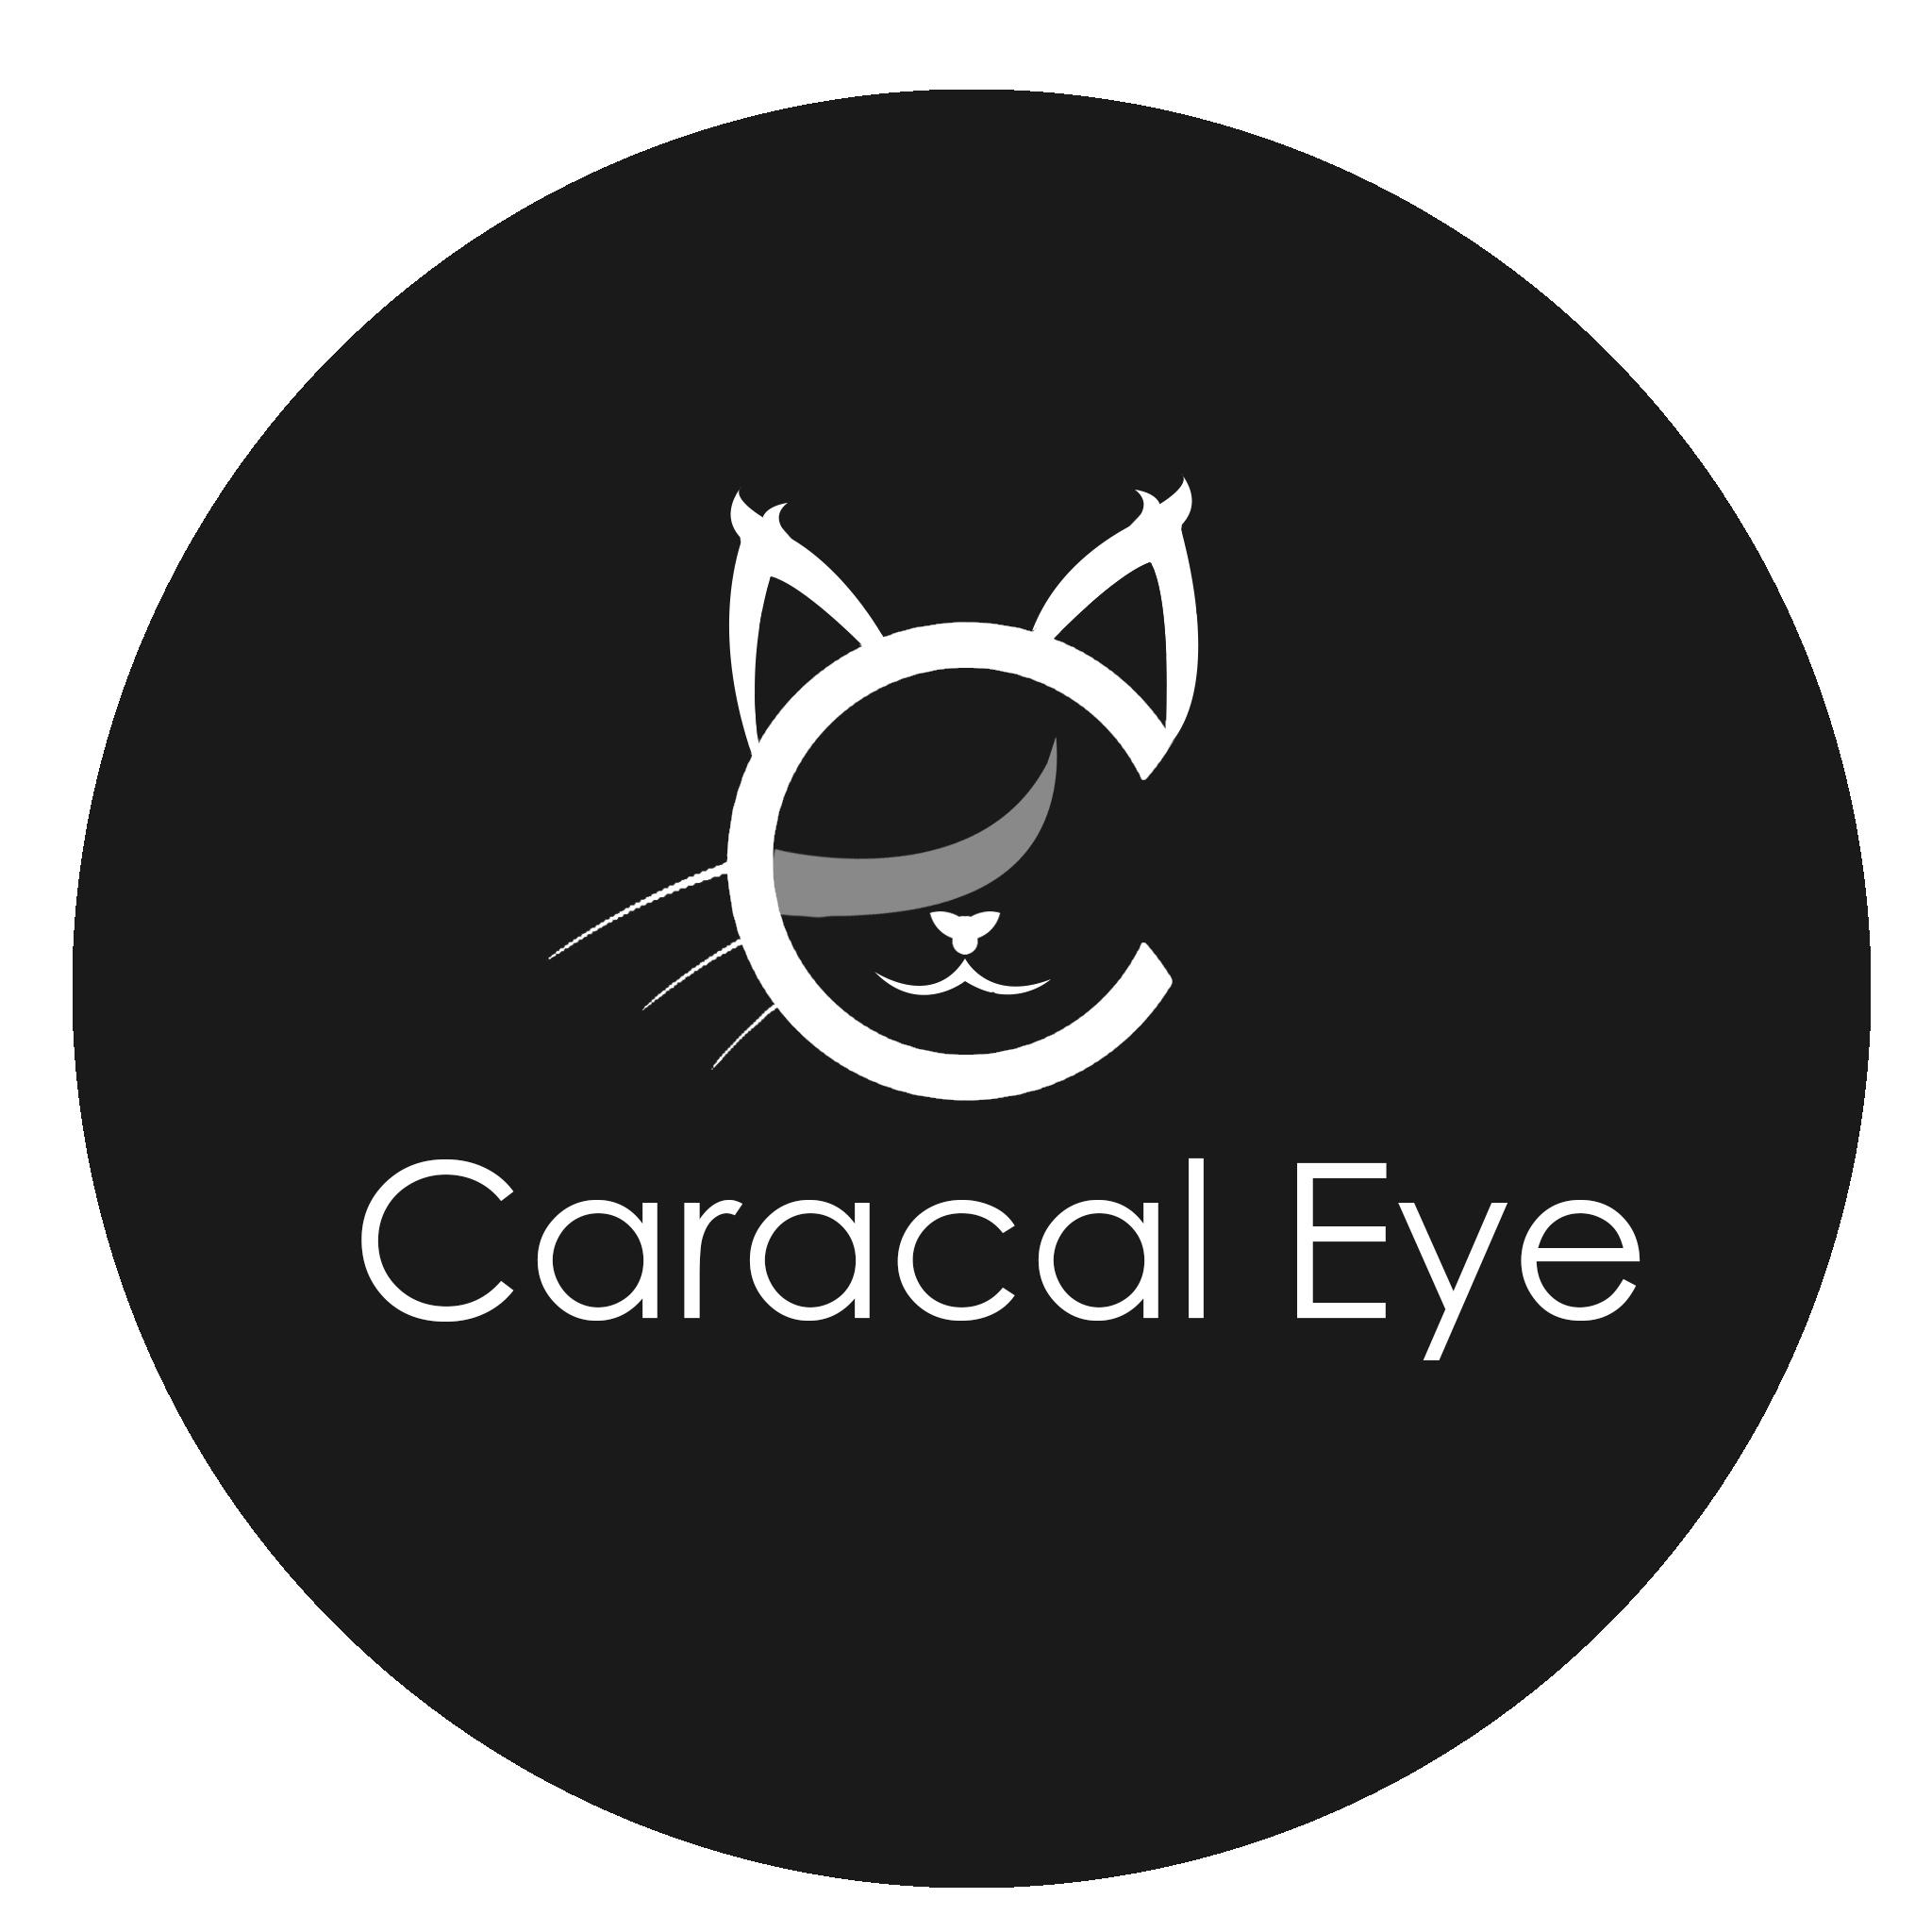 File:Caracal Eye Company Logo.png - Wikimedia Commons